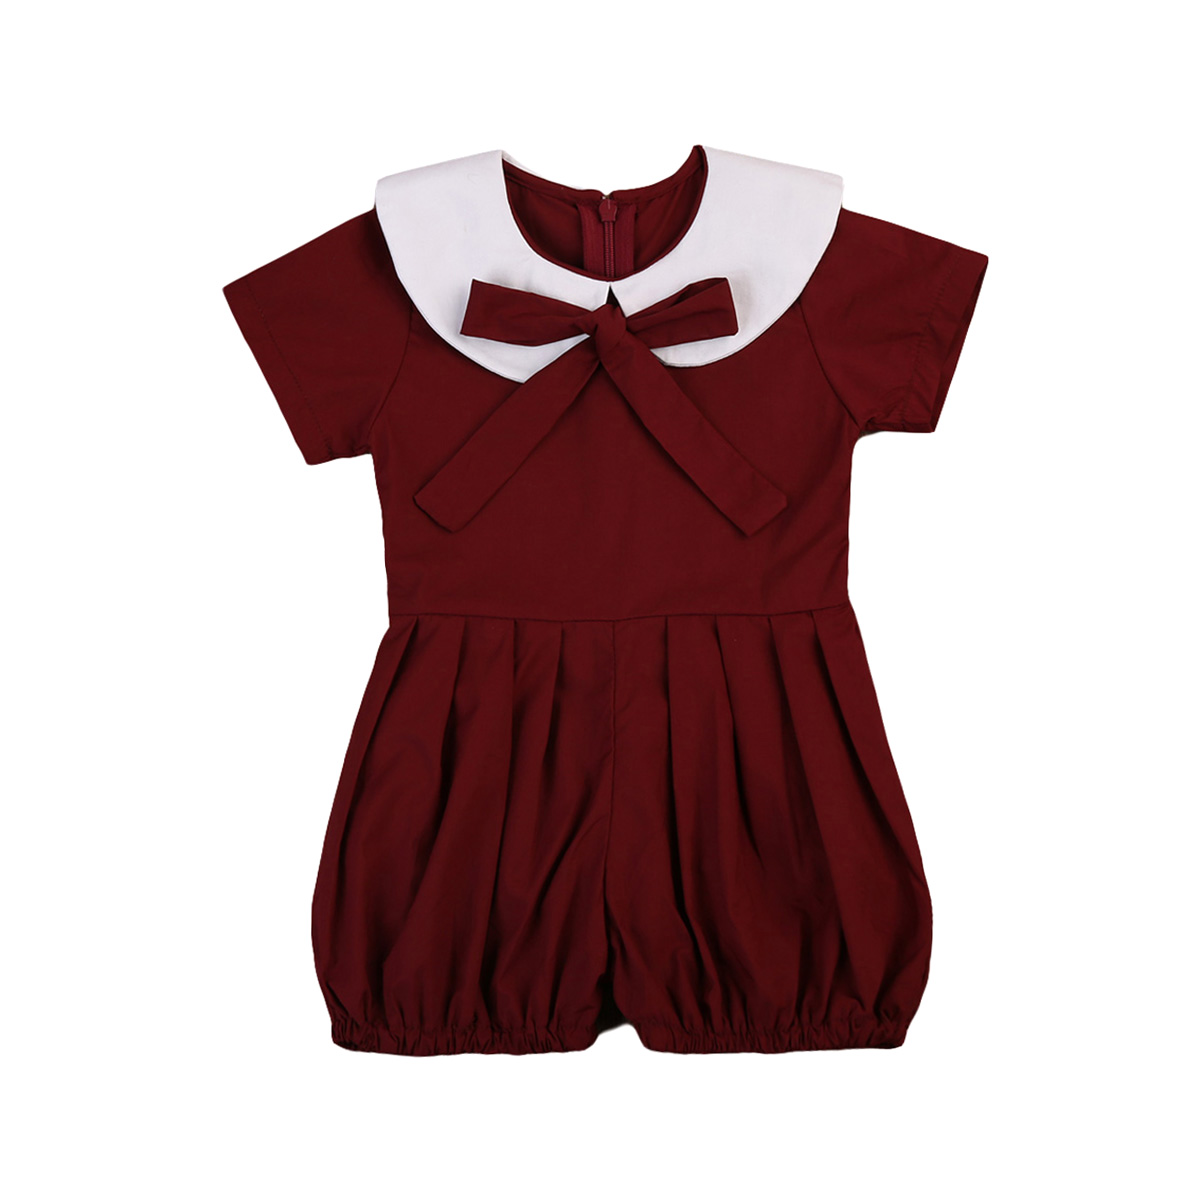 toddler school girl jumper clothes romper wine red uniform kids girls clothing summer outfit in. Black Bedroom Furniture Sets. Home Design Ideas